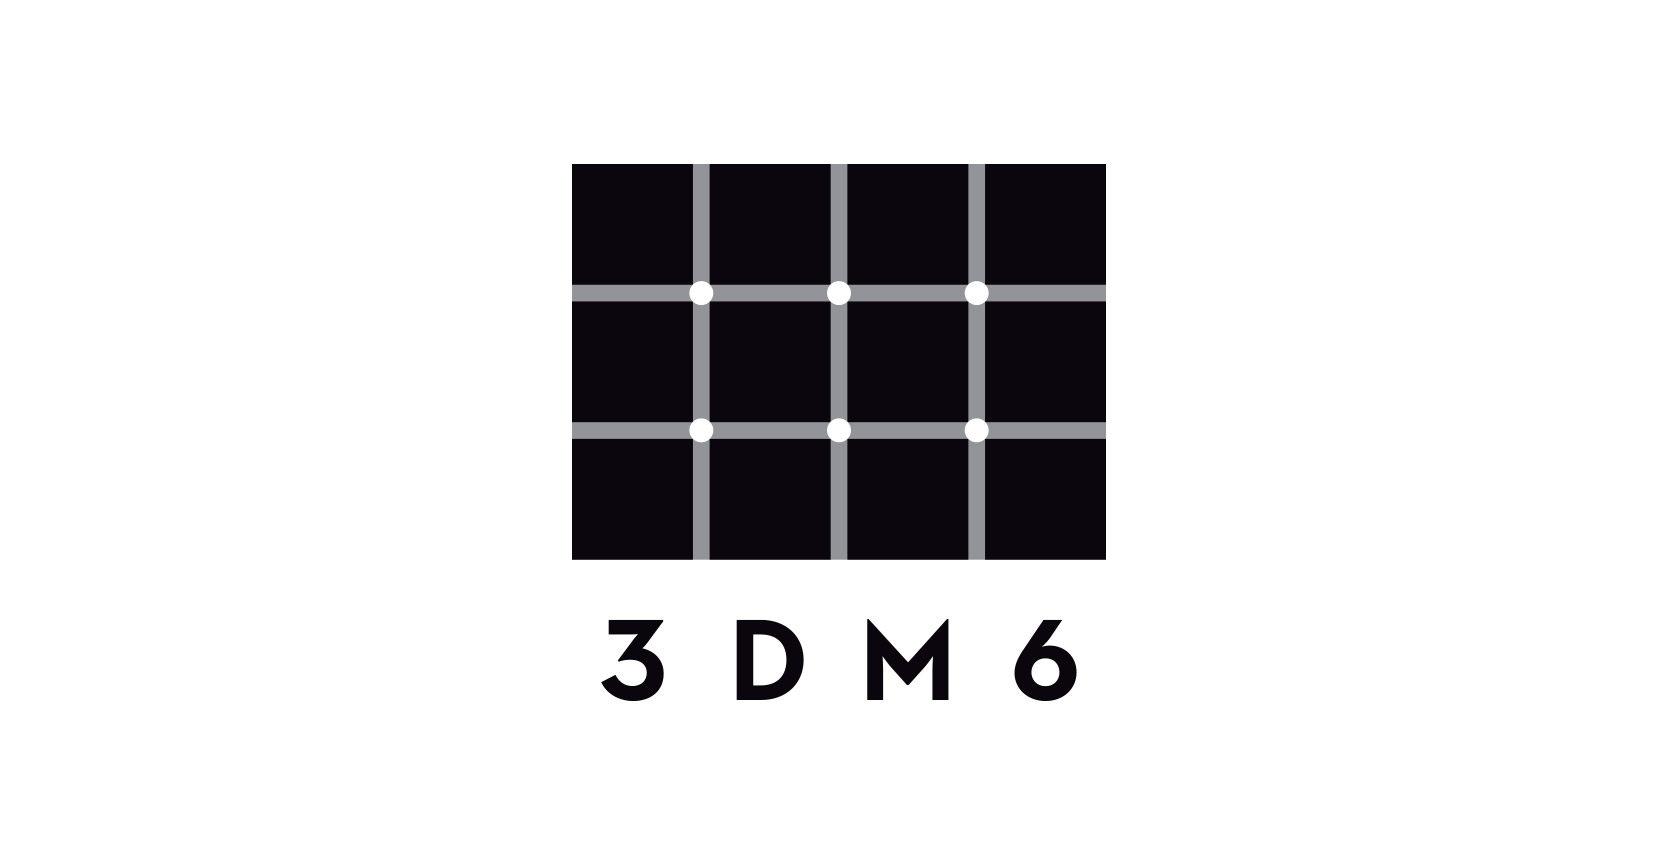 3DM6 Brand Identity Design by Furia